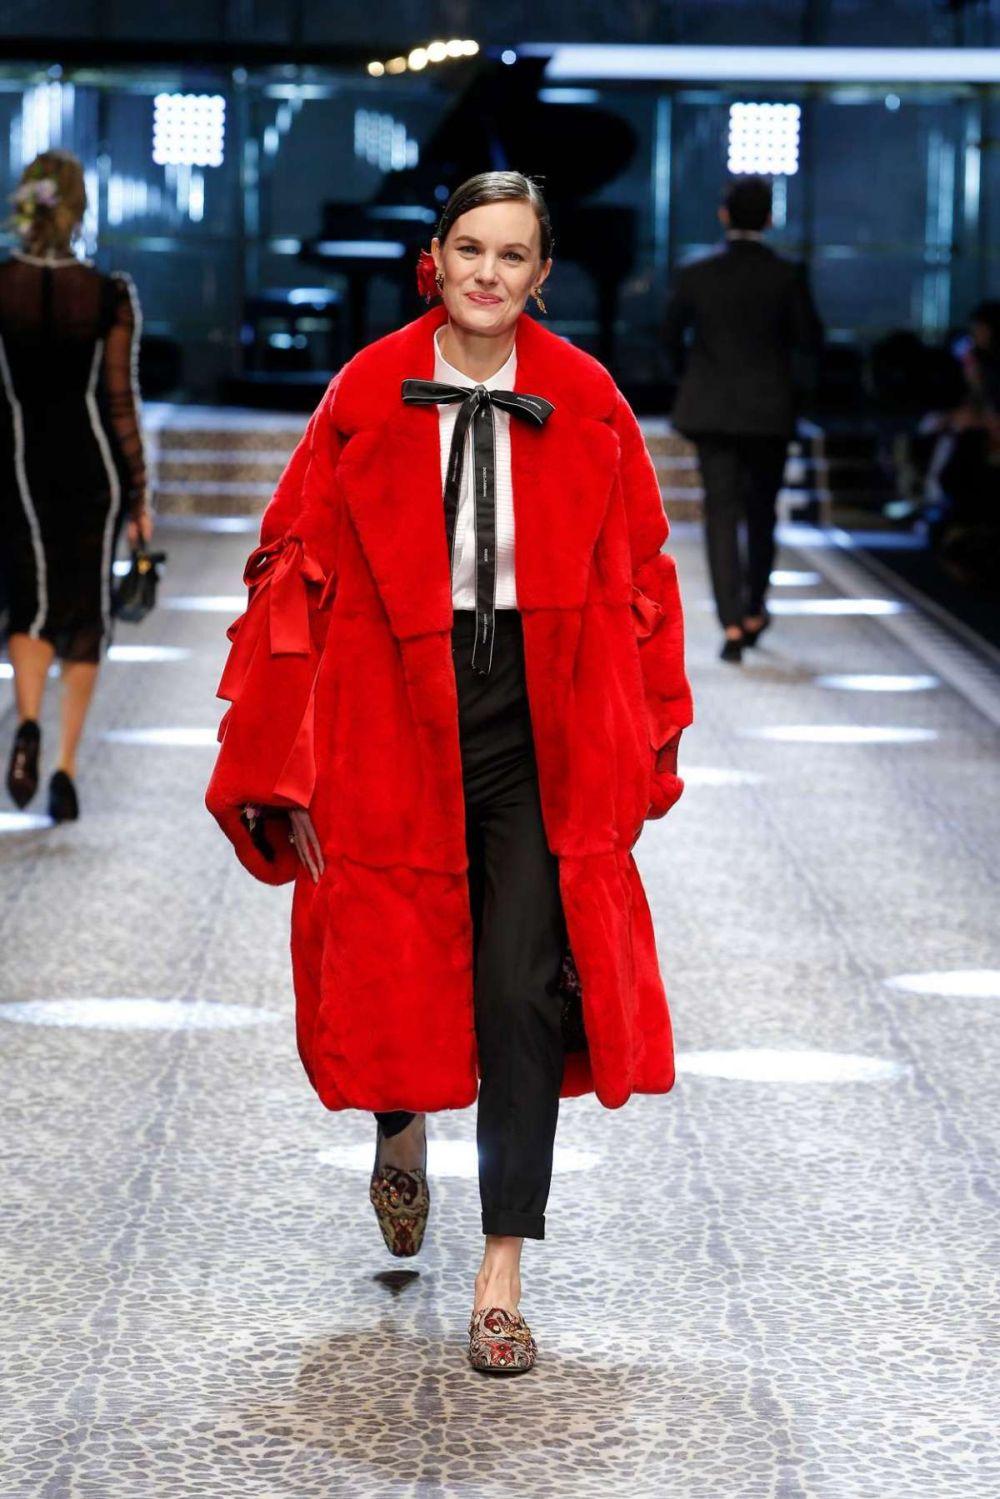 cappotto-rosso-dolce-gabbana - Velvet Style - VelvetStyle 68eb33c512b3